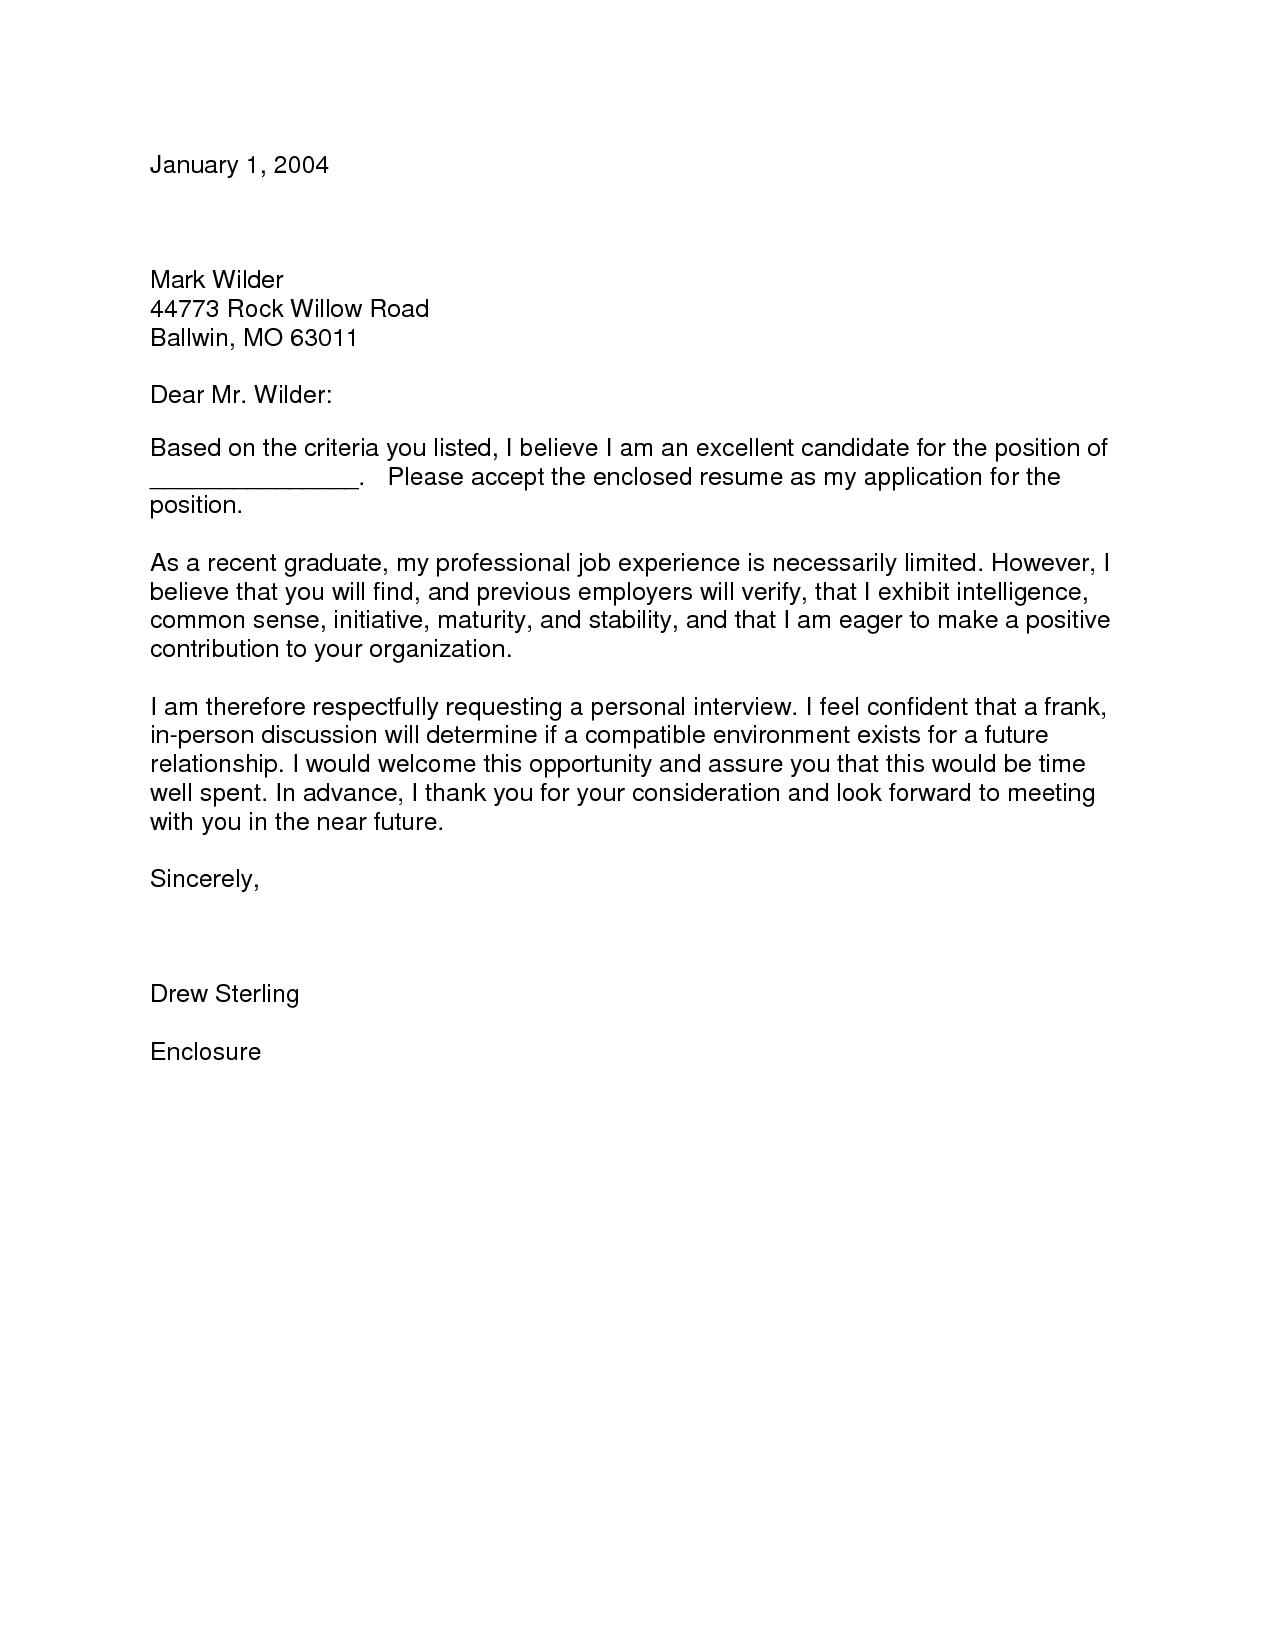 Cover Letter Recent Graduate Cover Letter For Resume Nursing Cover Letter Nurse Cover